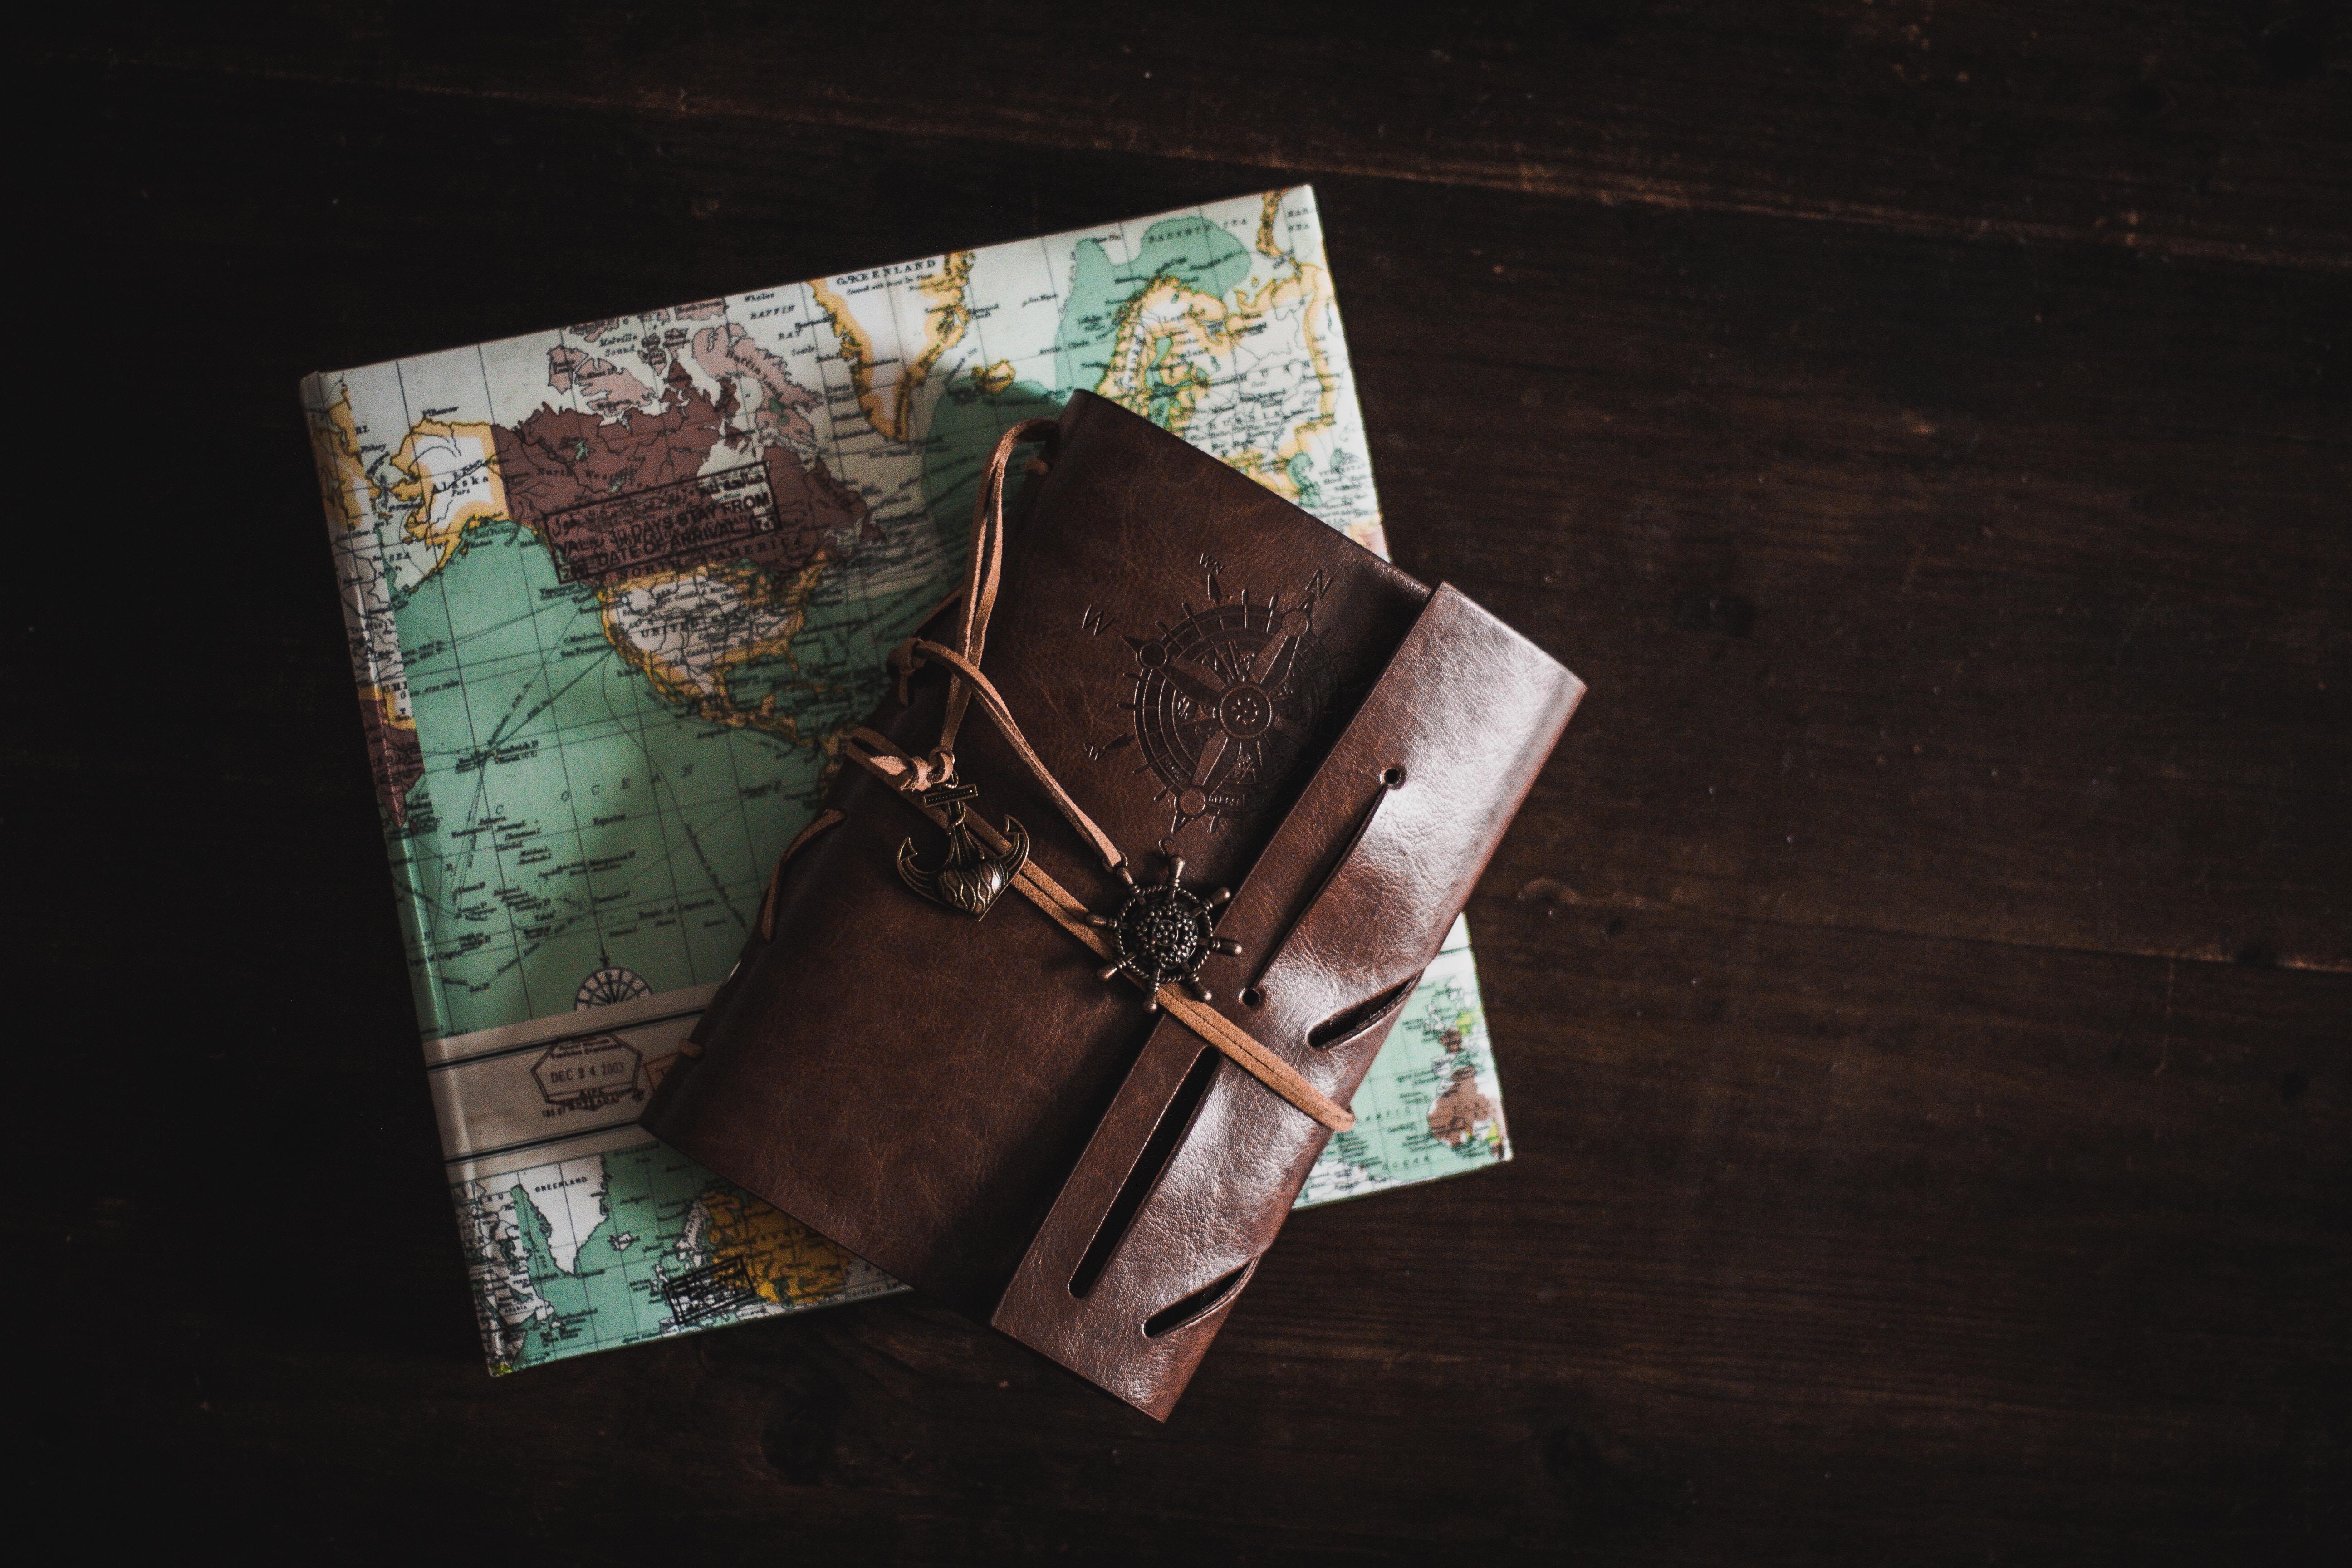 regali di natale alternativi ed economici